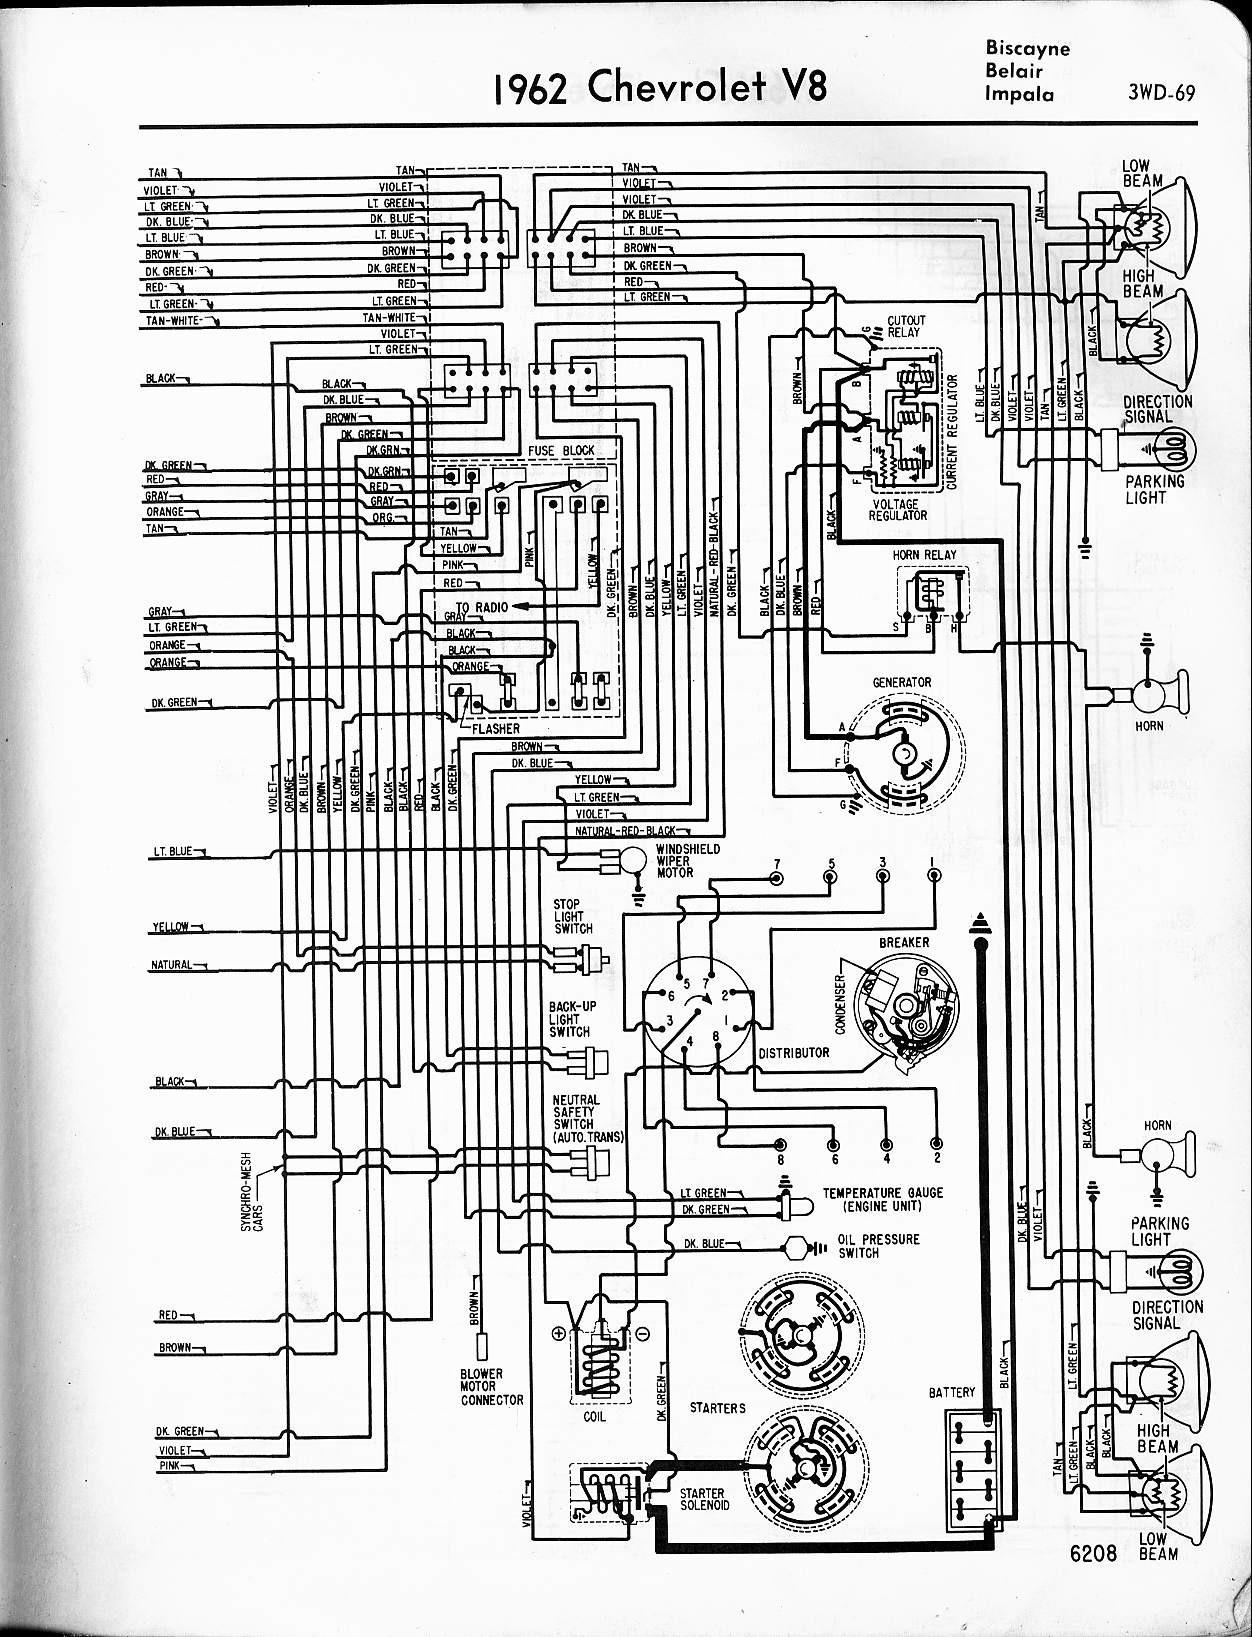 [SCHEMATICS_48EU]  1966 Impala Wiring Schematic - 2001 Ford Taurus Engine Diagram Hoses for Wiring  Diagram Schematics | 1966 Chevrolet Impala Wiring Diagram Free Picture |  | Wiring Diagram Schematics